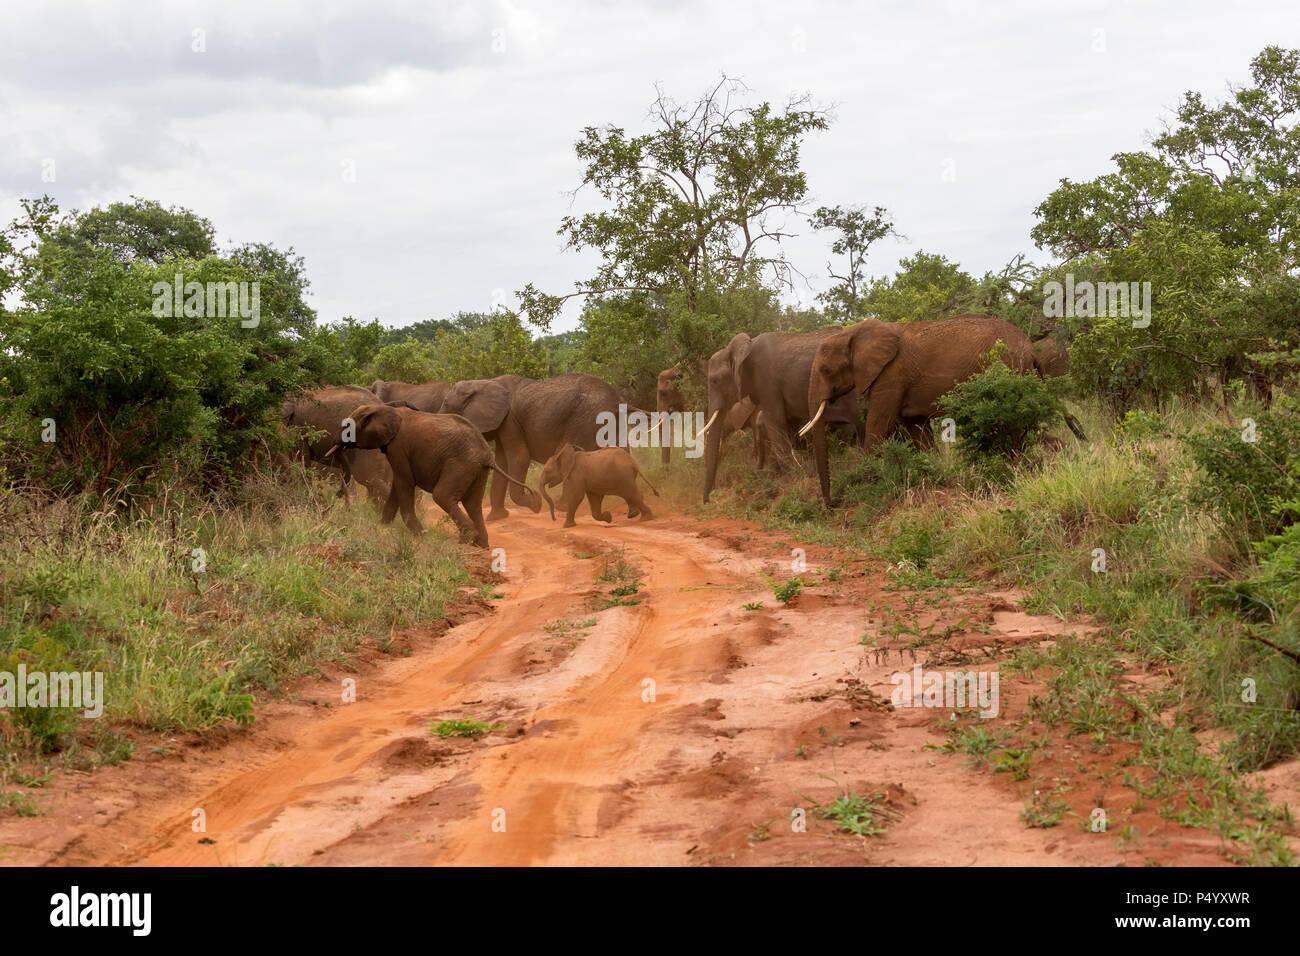 African Elephant (Loxodonta africana) herd in woodland savannah in Tarangire National Park, Tanzania - Stock Image